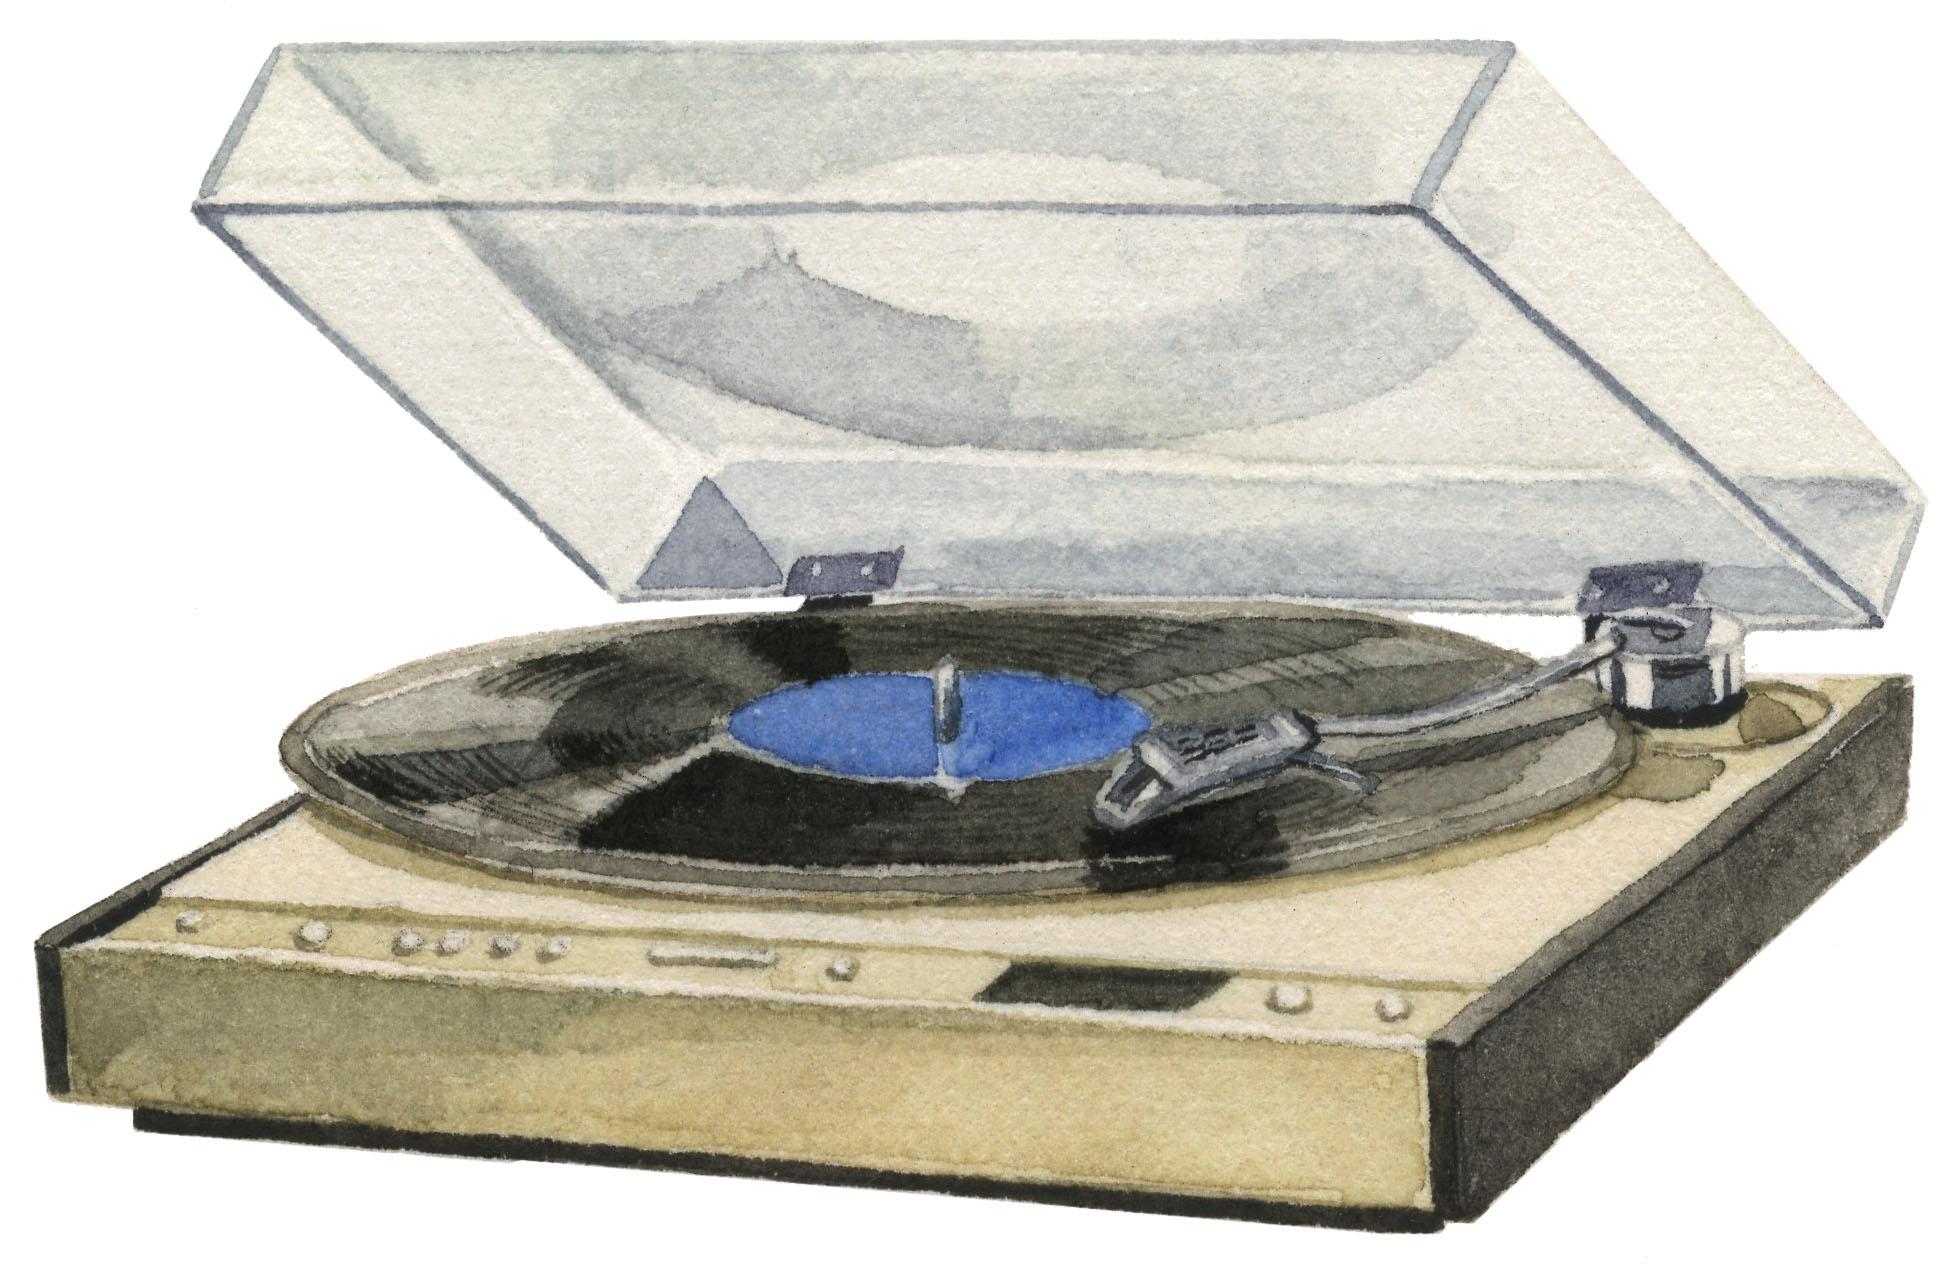 record-player-lrg.jpg